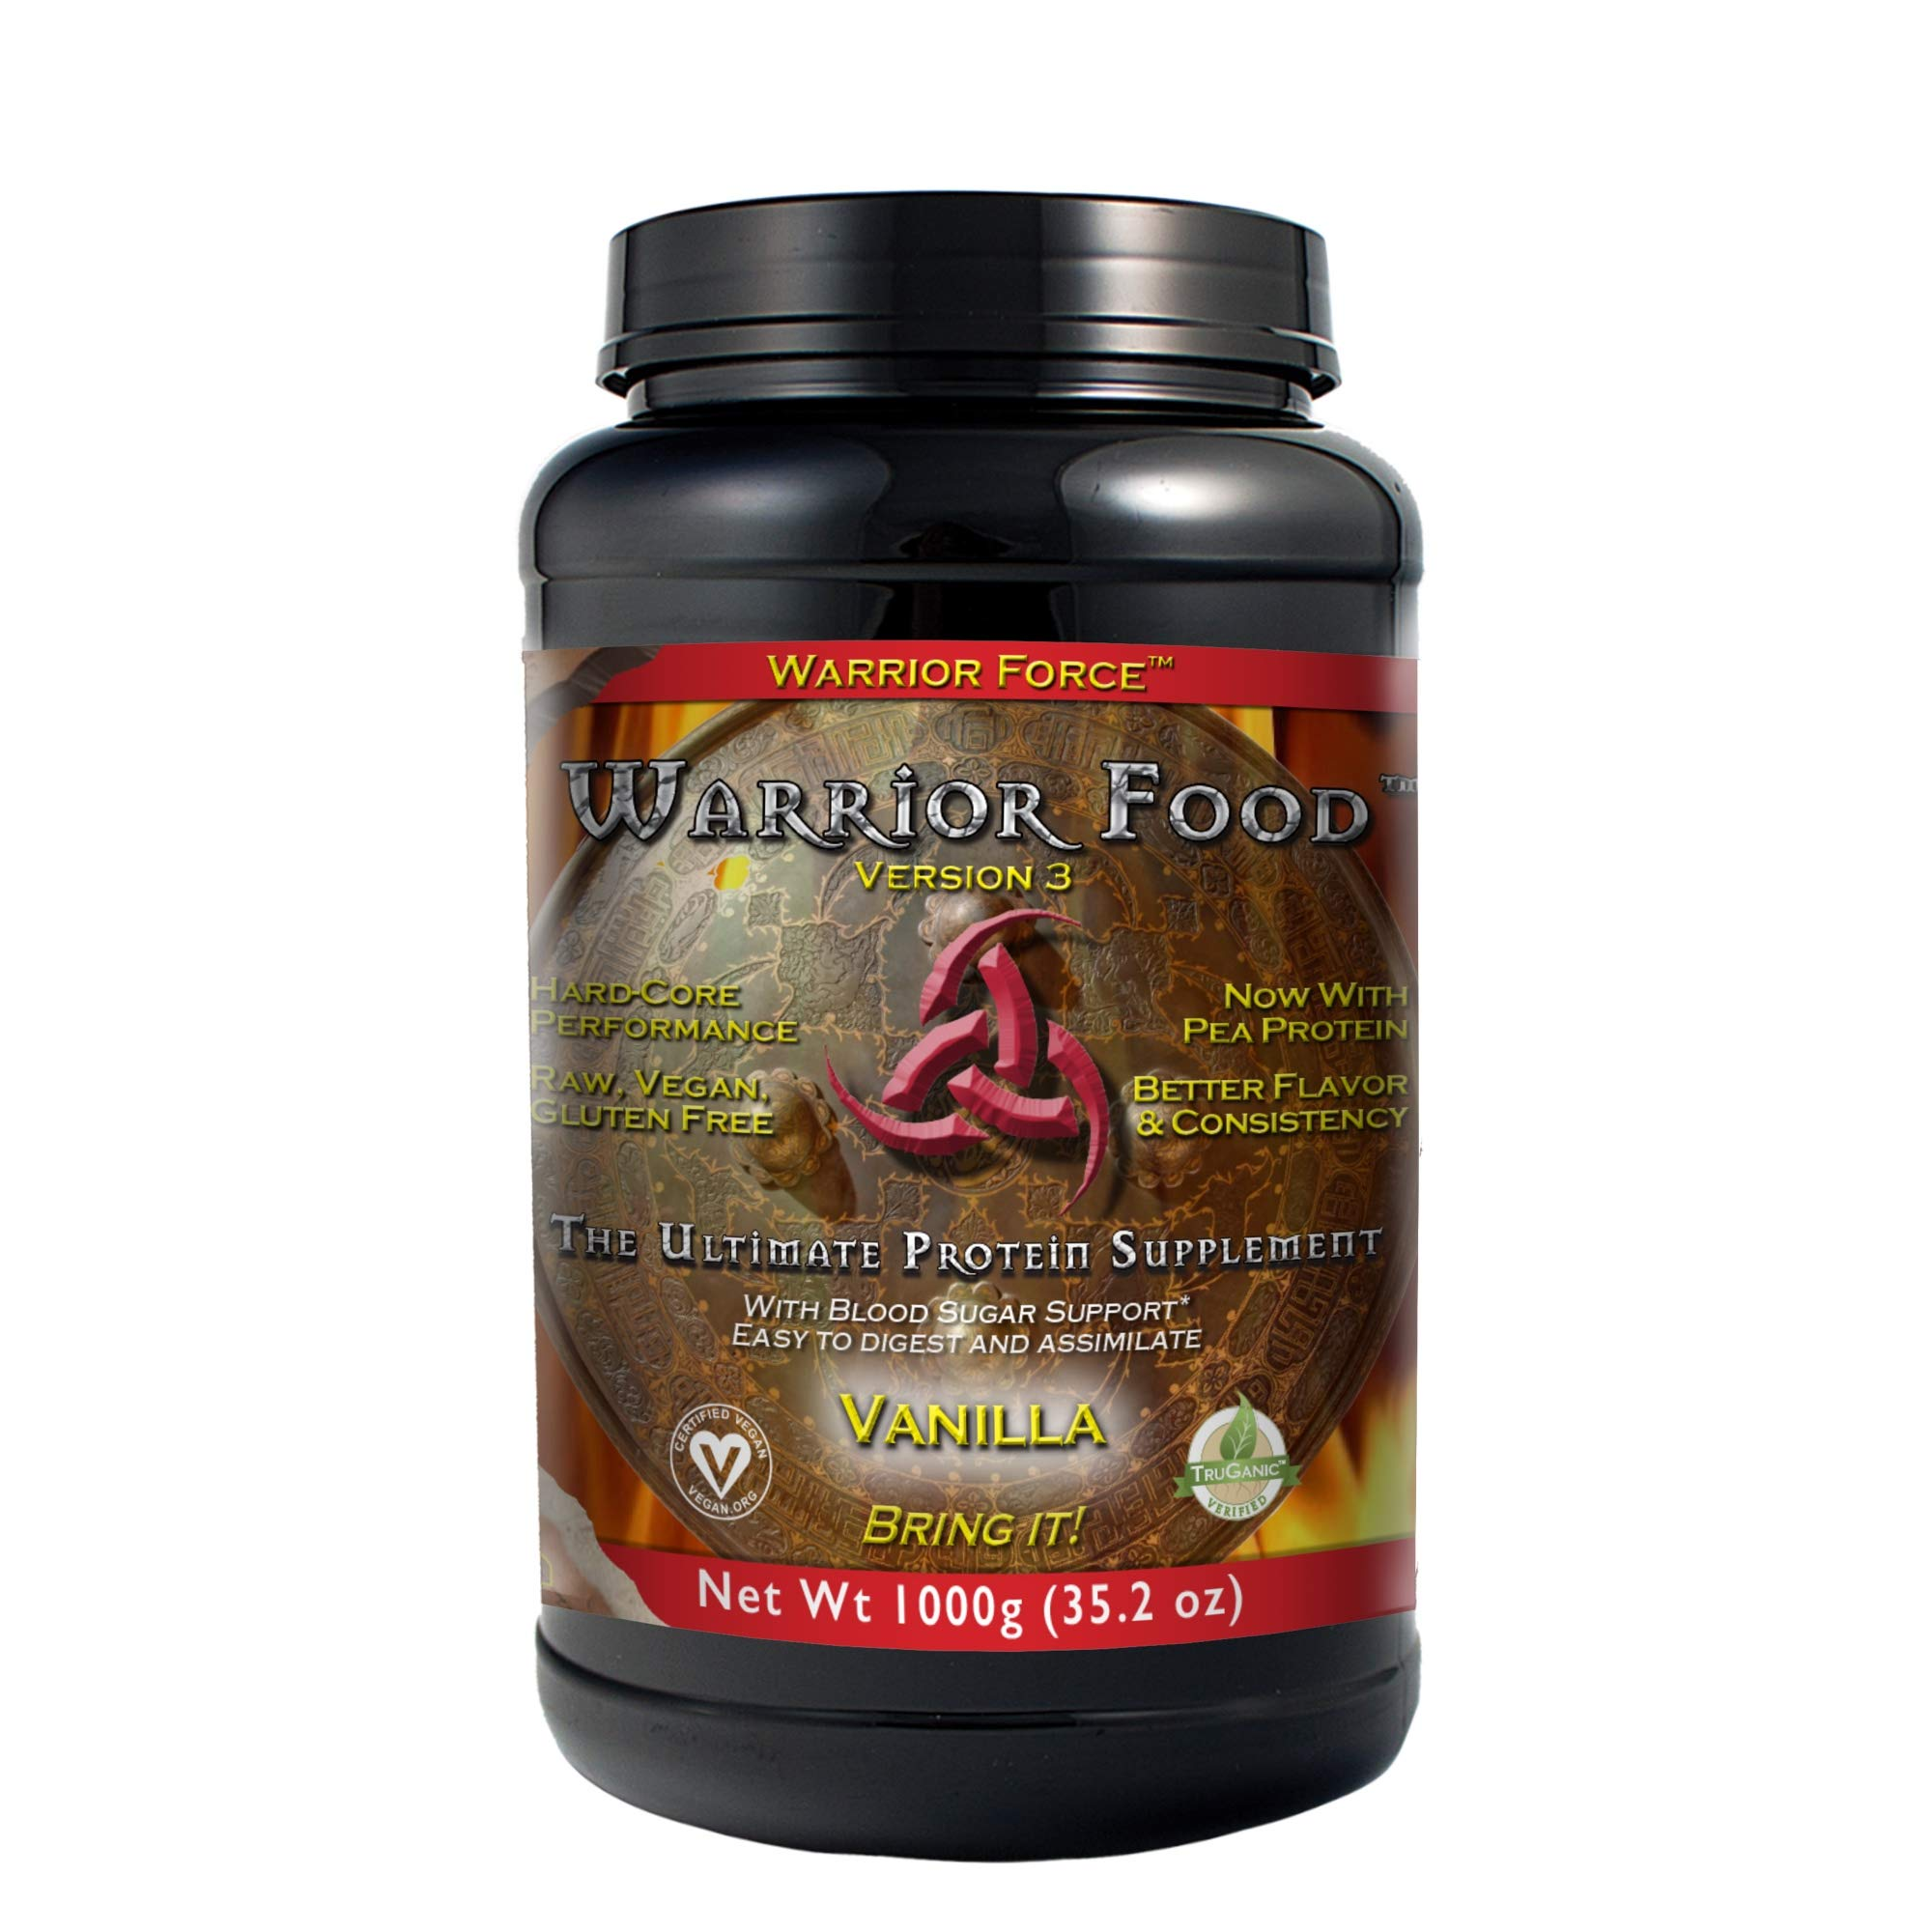 HealthForce SuperFoods Warrior Food, Vegan Protein Powder, Sports Nutrition Alternative, Plant-Based, All Natural, Organic, Gluten-Free, Vanilla, 1000 Grams